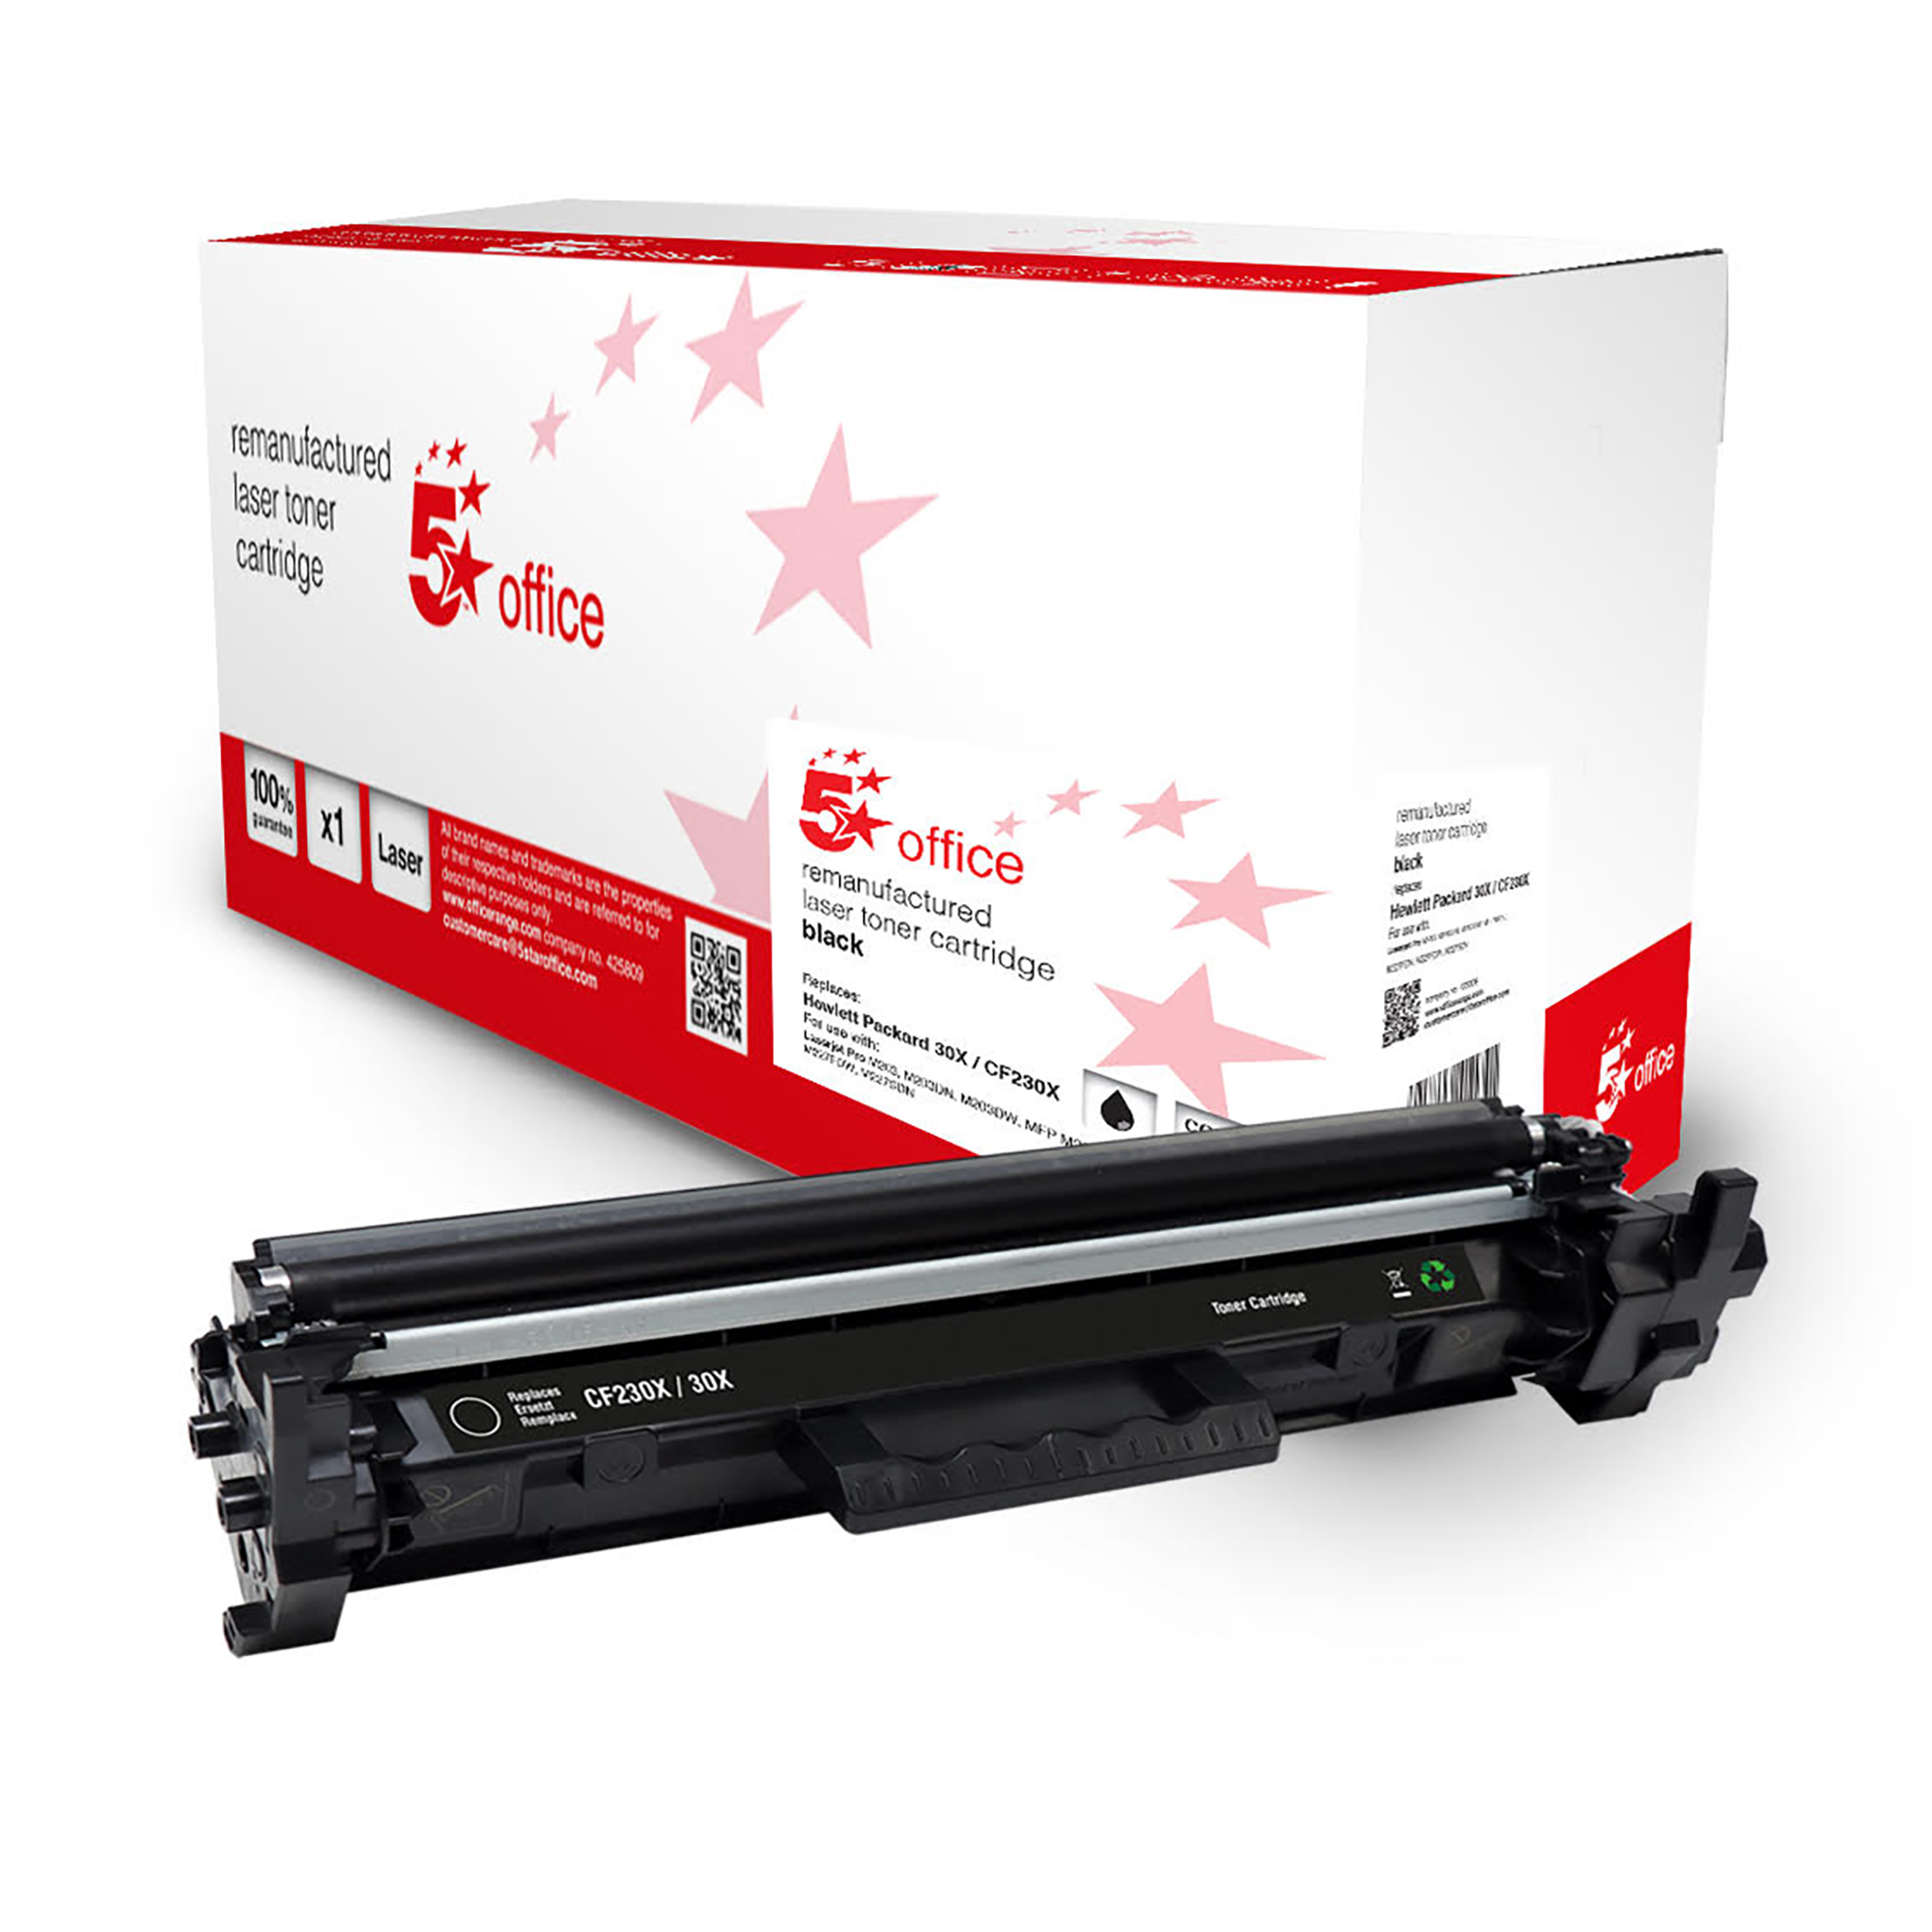 5 Star Office Remanufactured Toner Cartridge High Yield 3500pp Black HP 30X Alternative CF230X